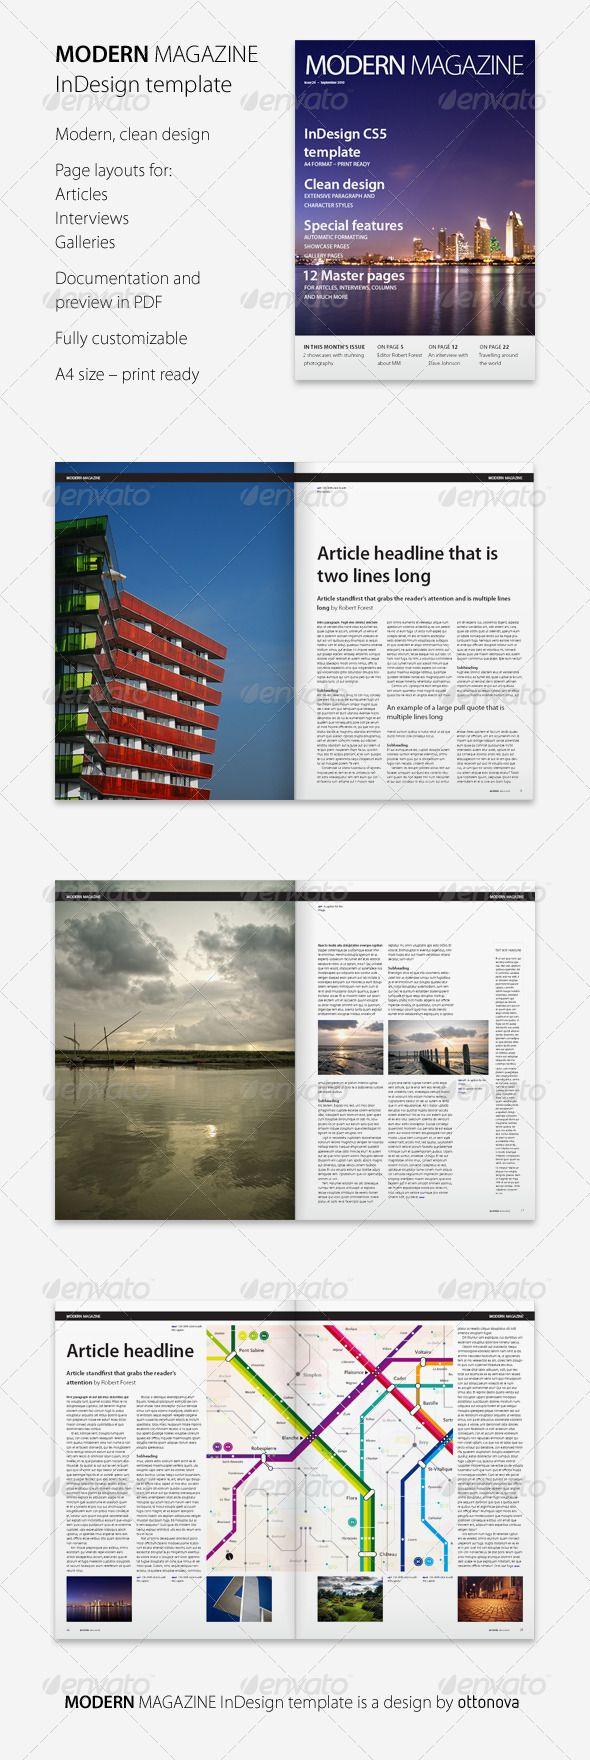 Modern Magazine InDesign template | Indesign templates, Magazines ...